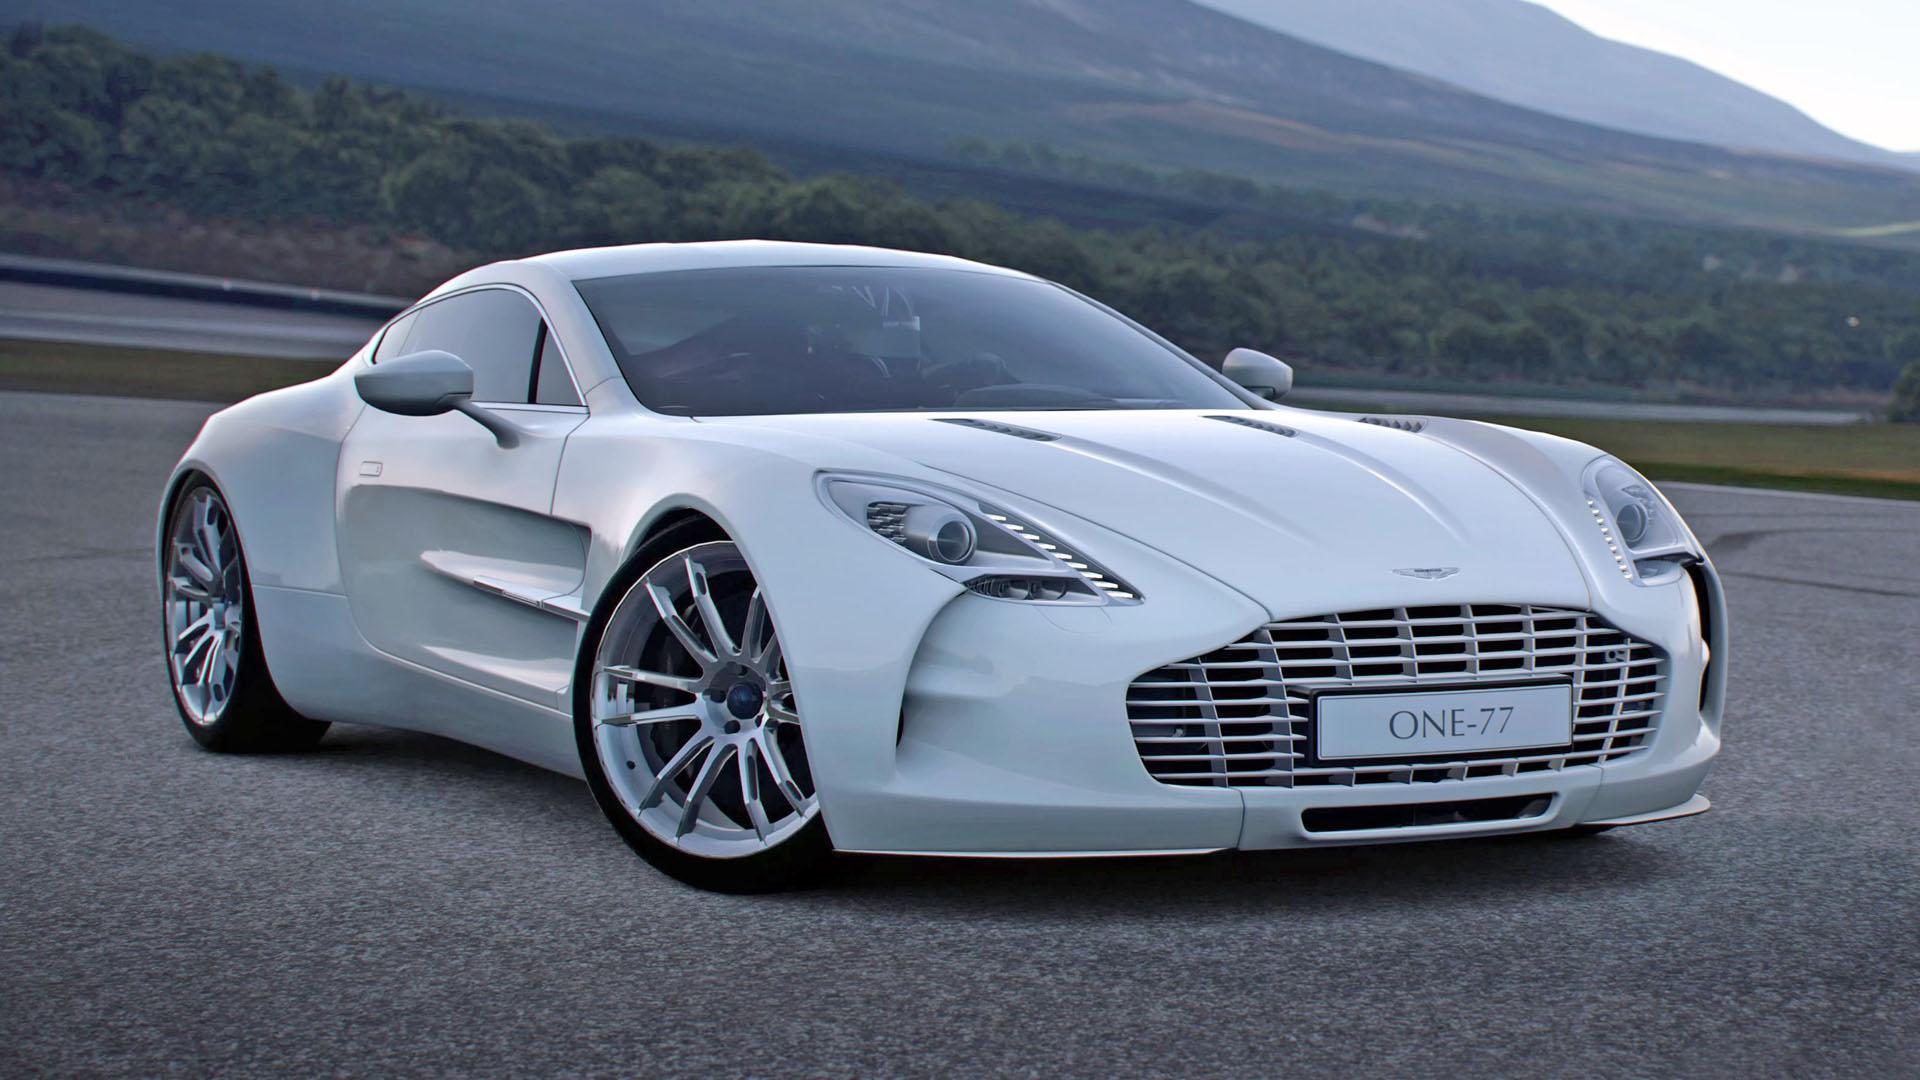 Coche del día: Aston Martin One 77